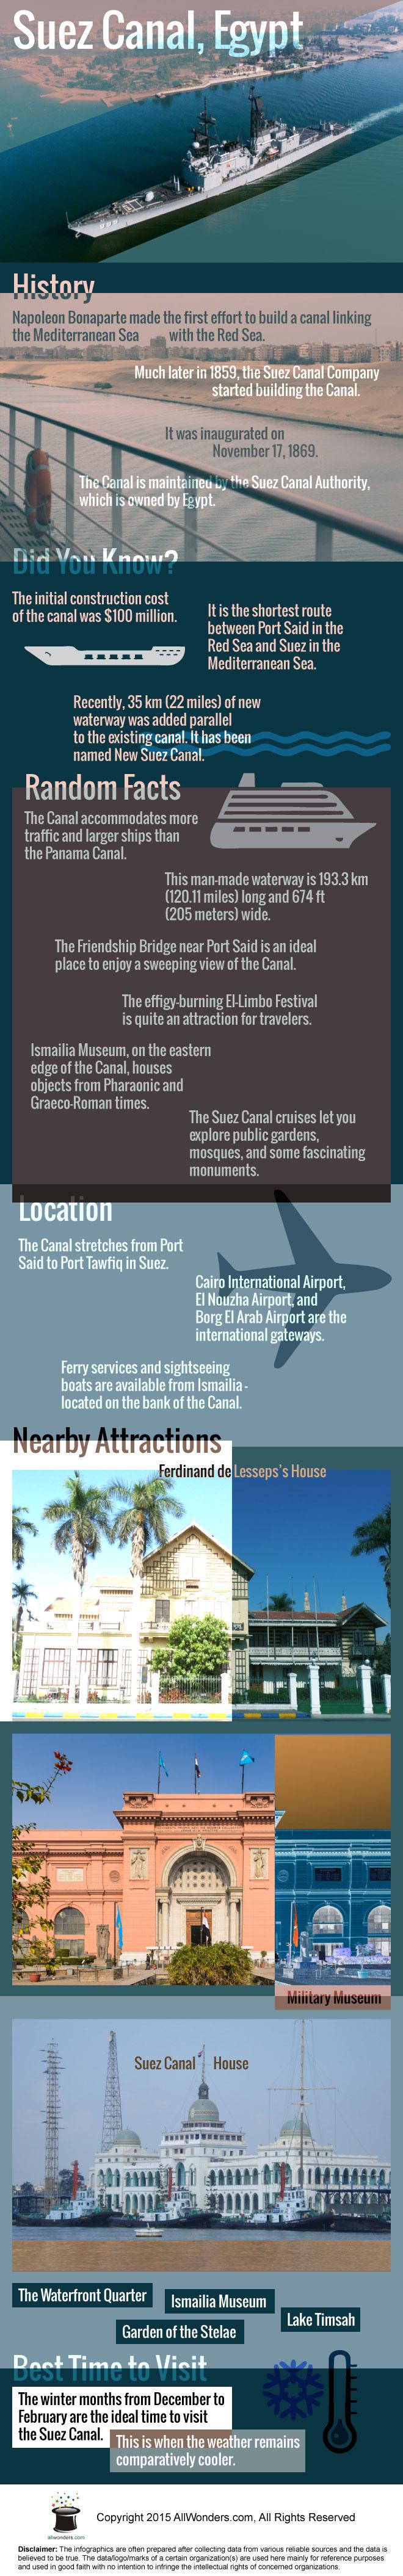 Suez Canal Infographic